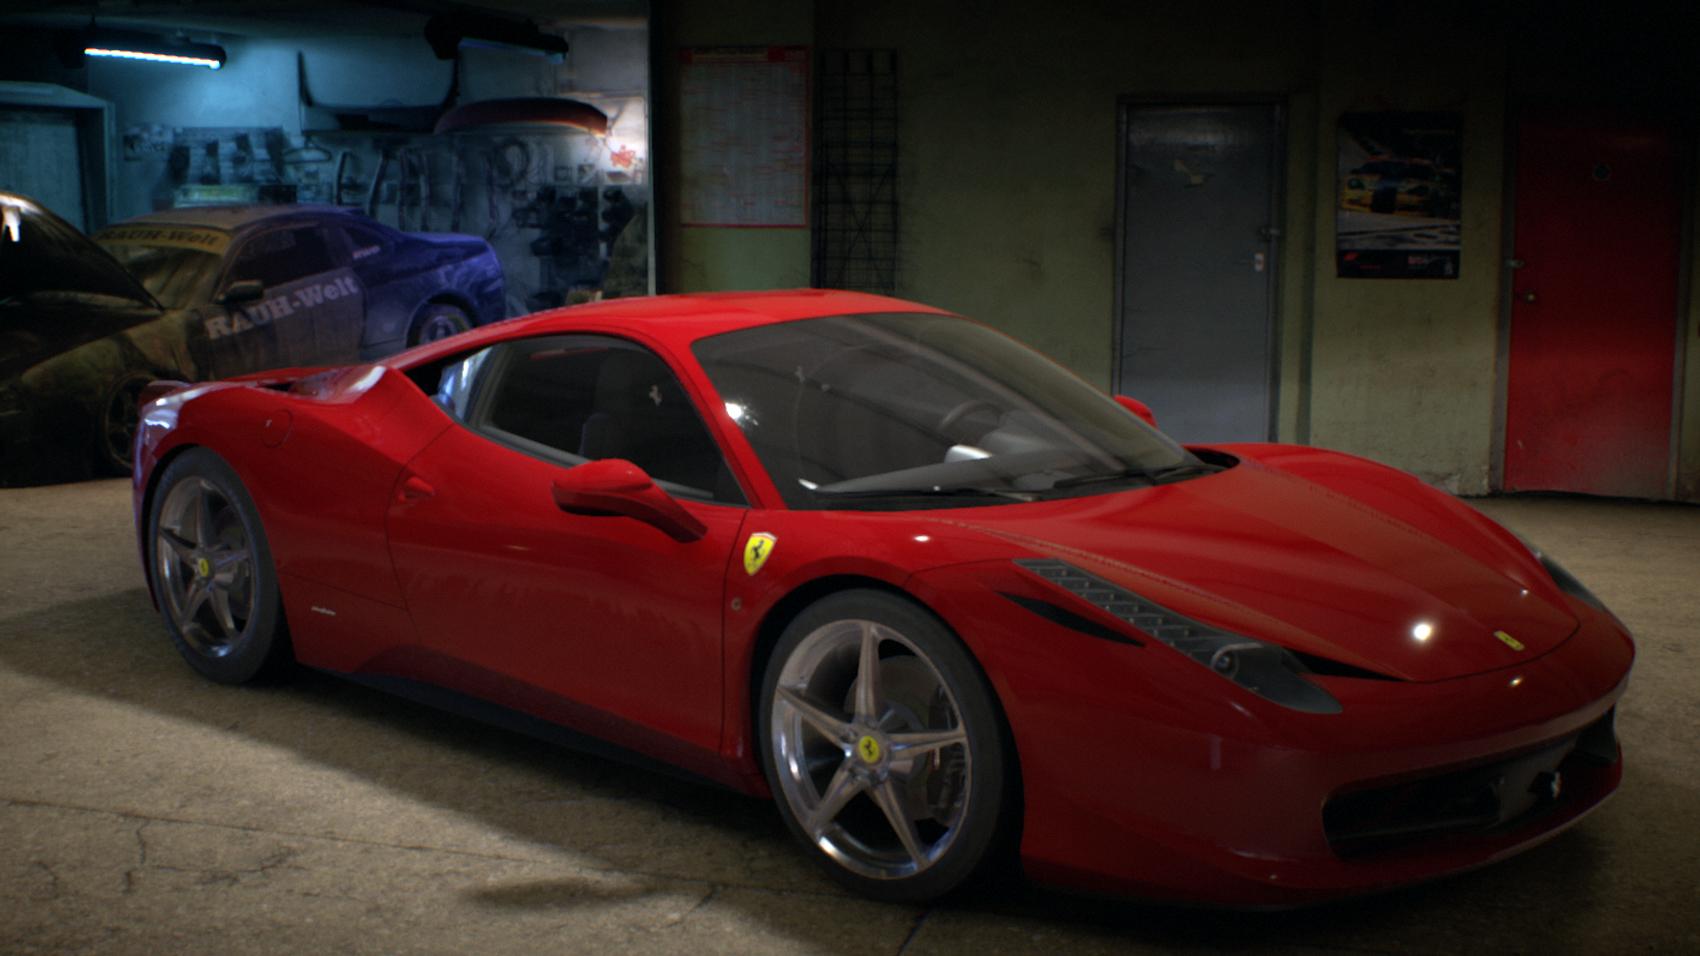 Ferrari 458 Italia Need For Speed Wiki Fandom